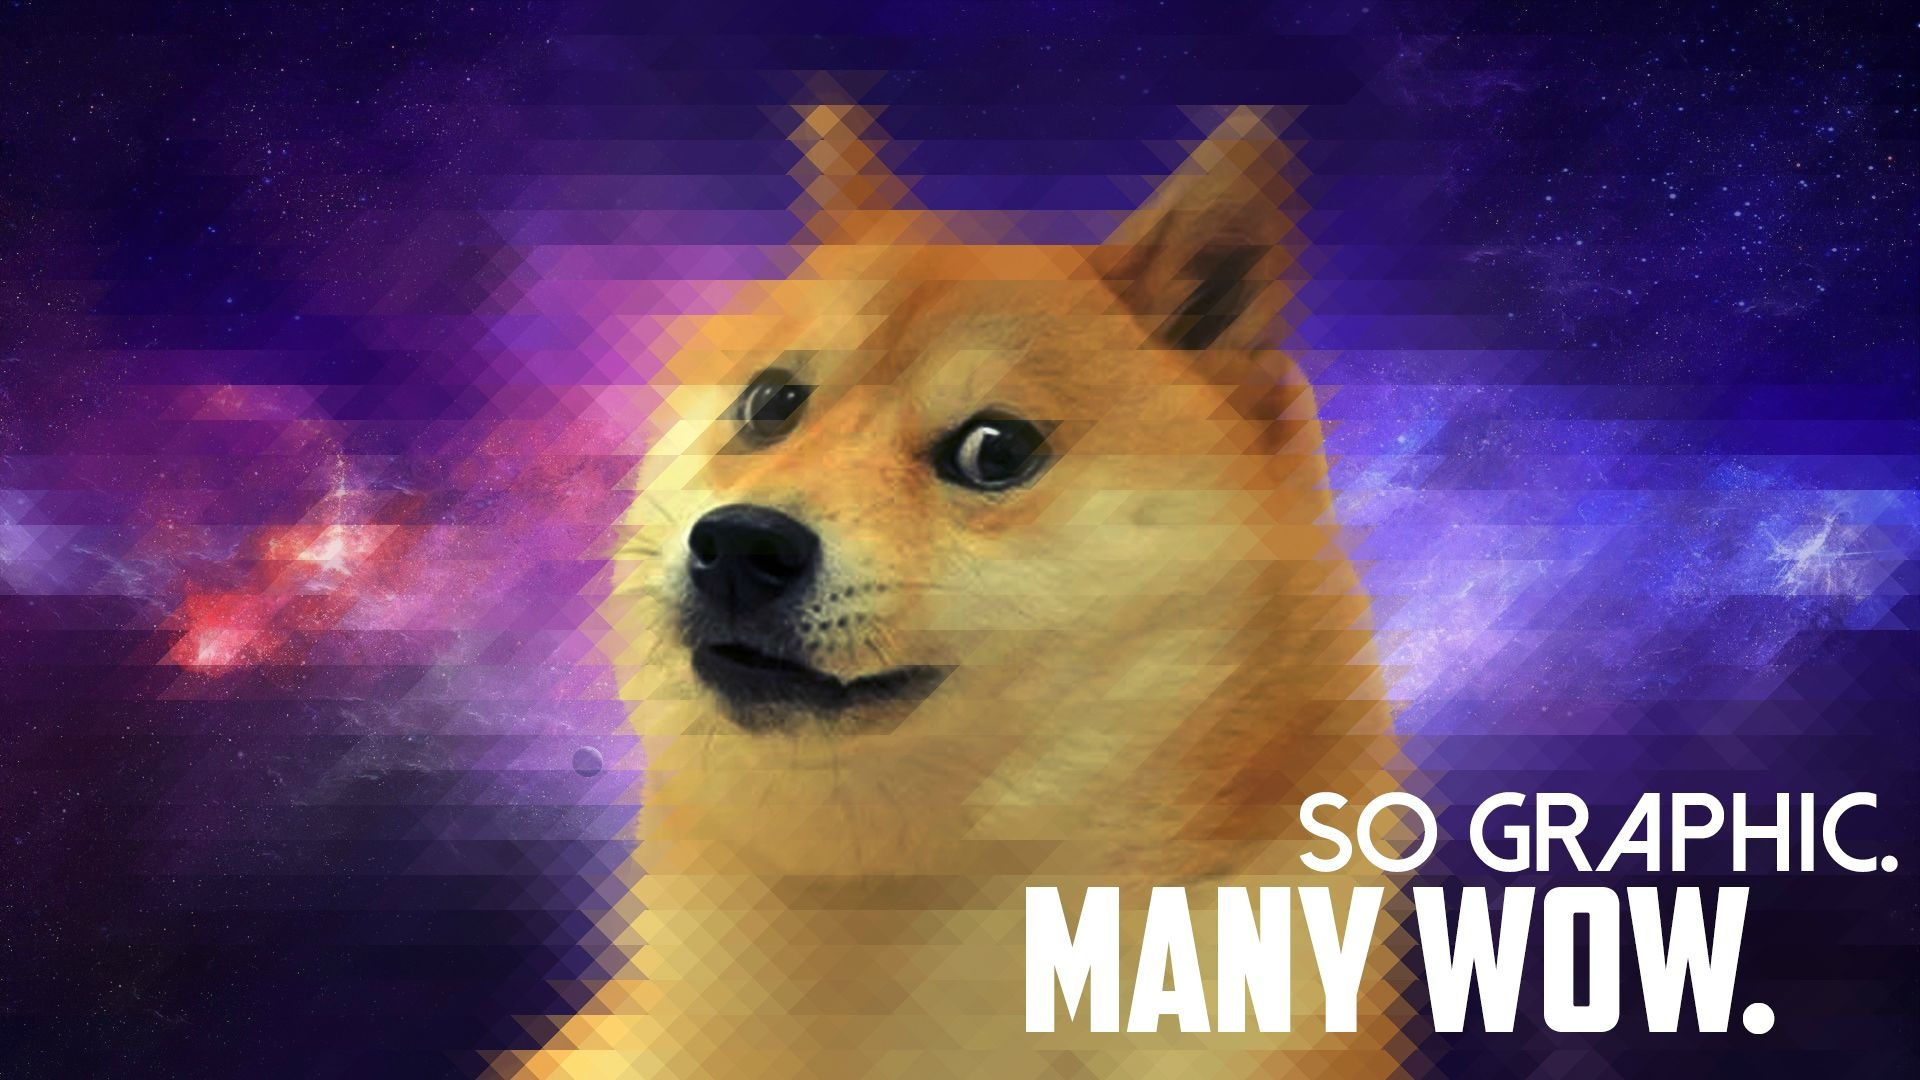 Doge Meme free wallpaper